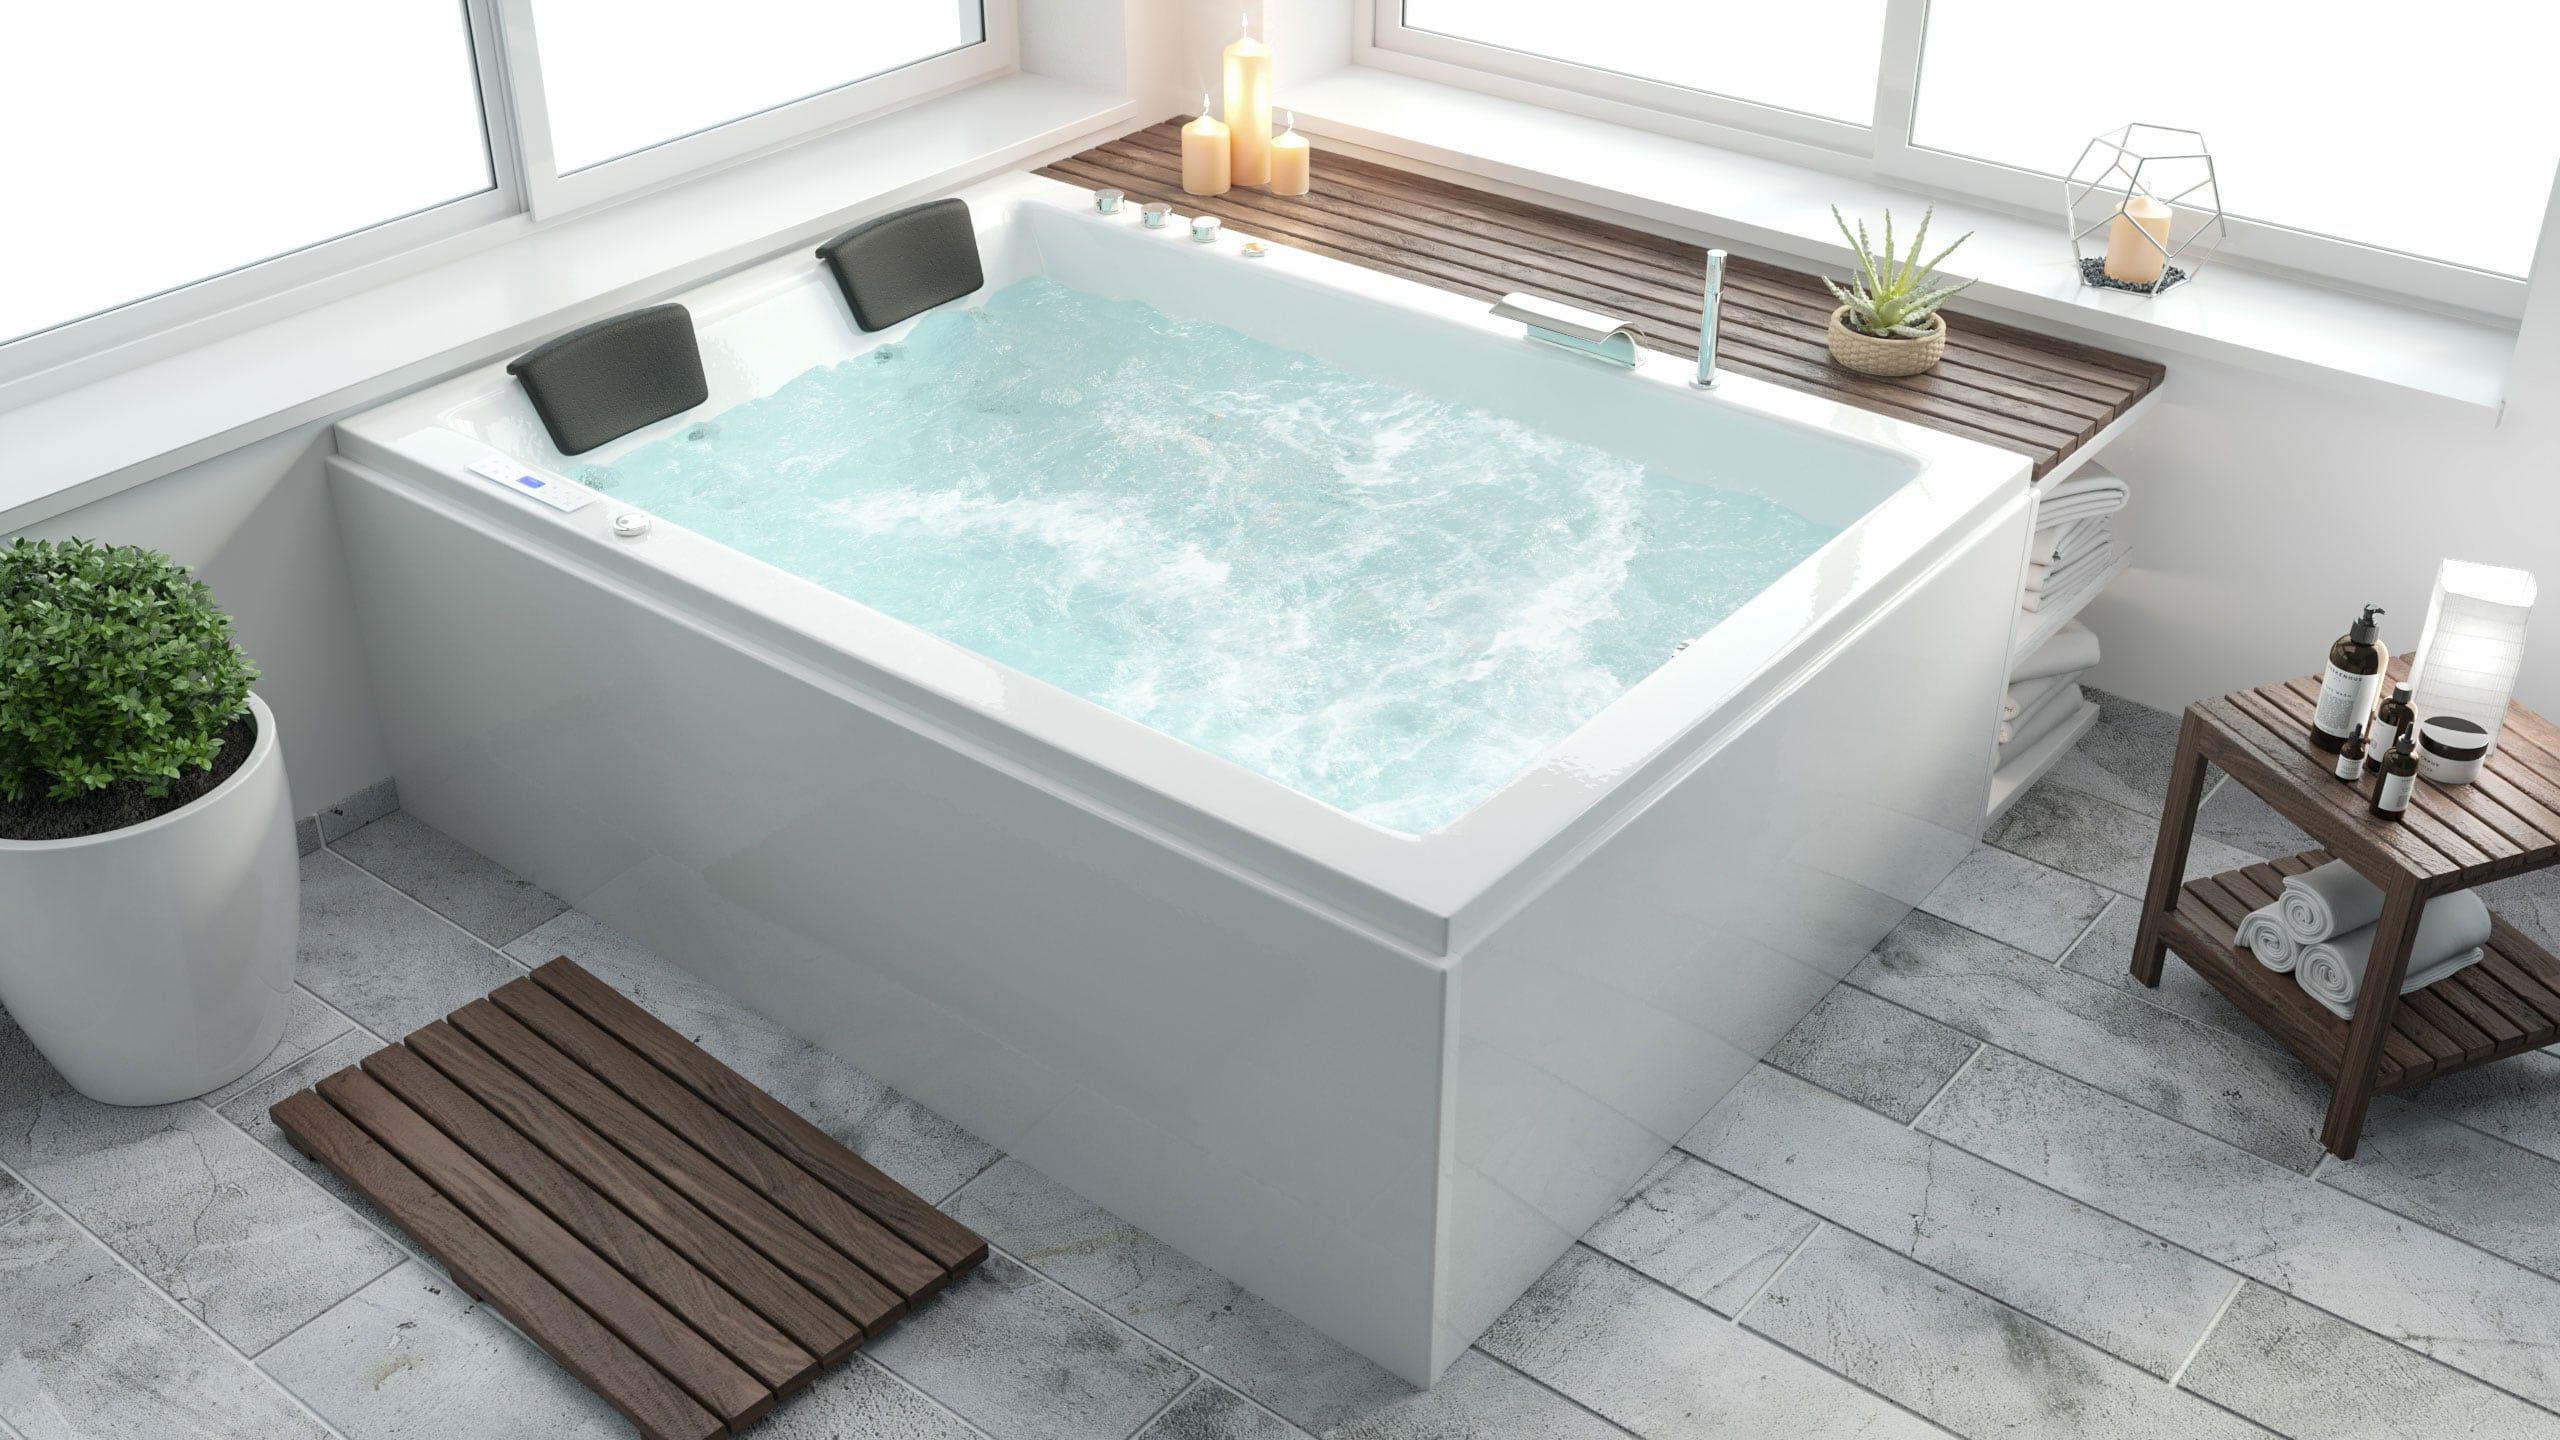 Andalusia Universal Premium Whirlpool Links 180x130x62 Cm Badewanne Badewanne Fur Zwei Badewanne Fur 2